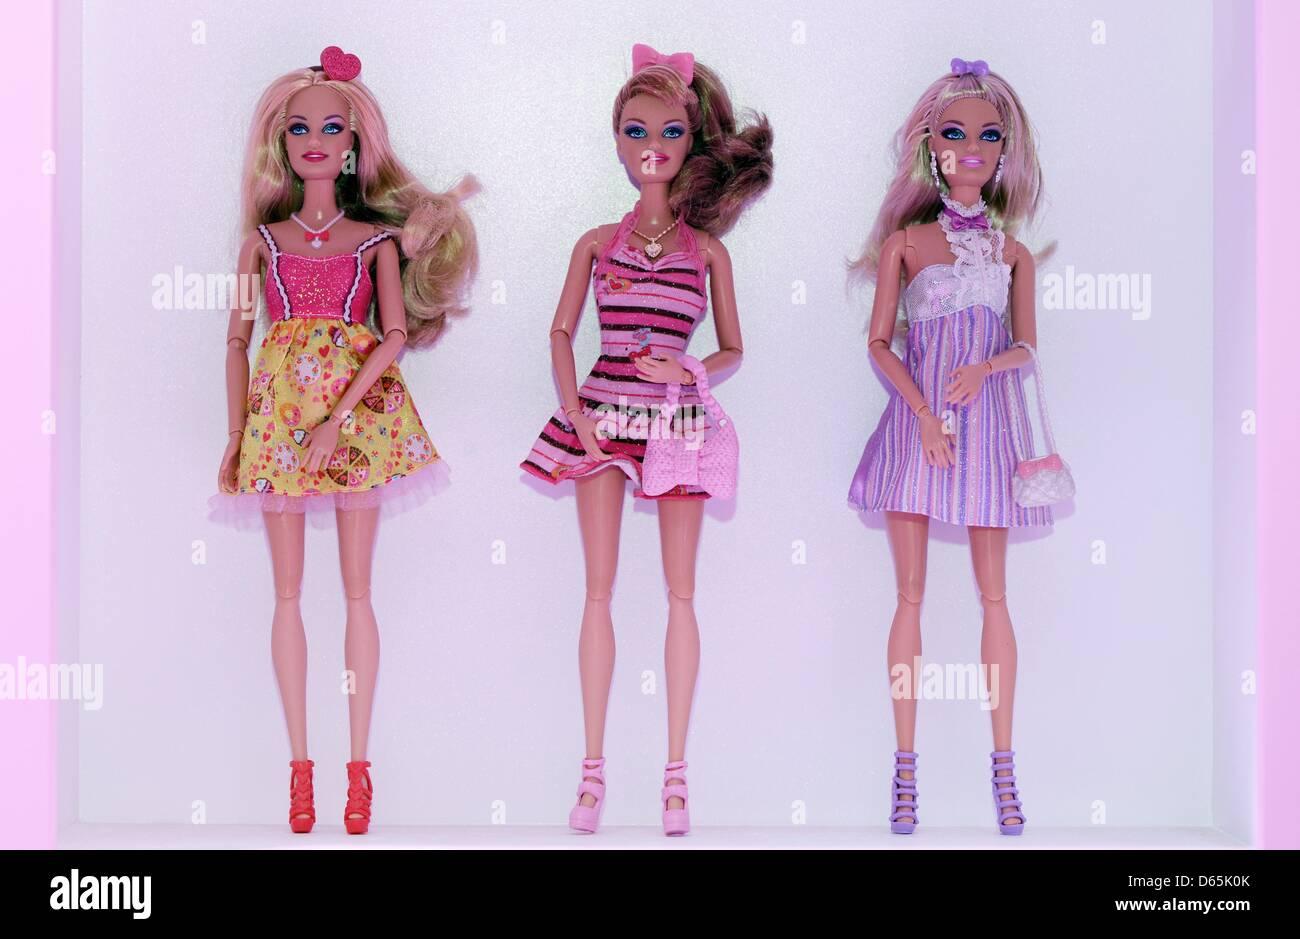 Barbie Horse Stock Photos Barbie Horse Stock Images Alamy